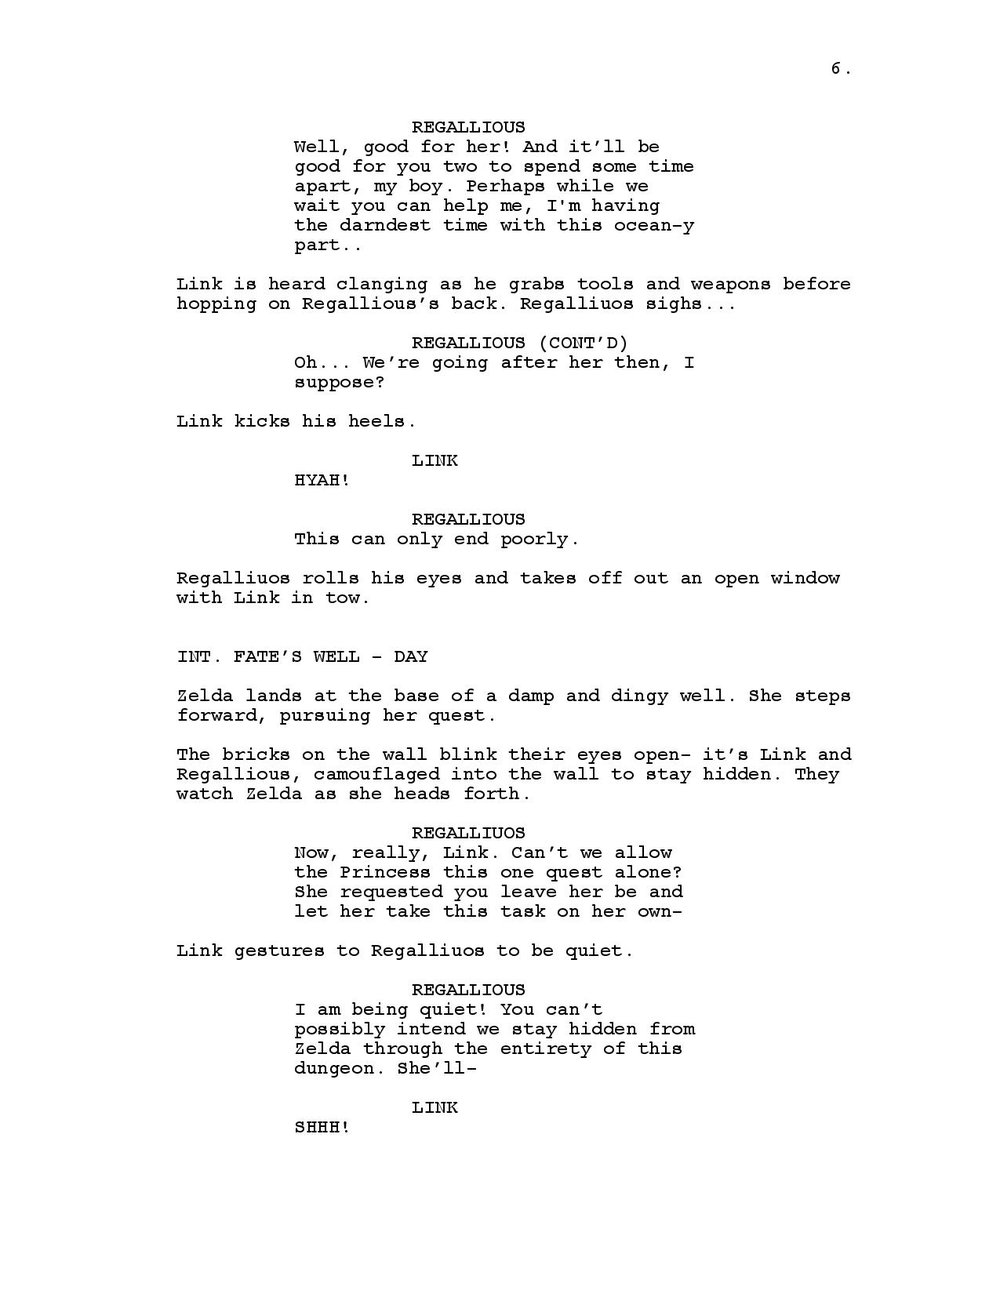 TheAdventuresofZelda&Link_Pilot-page-006.jpg